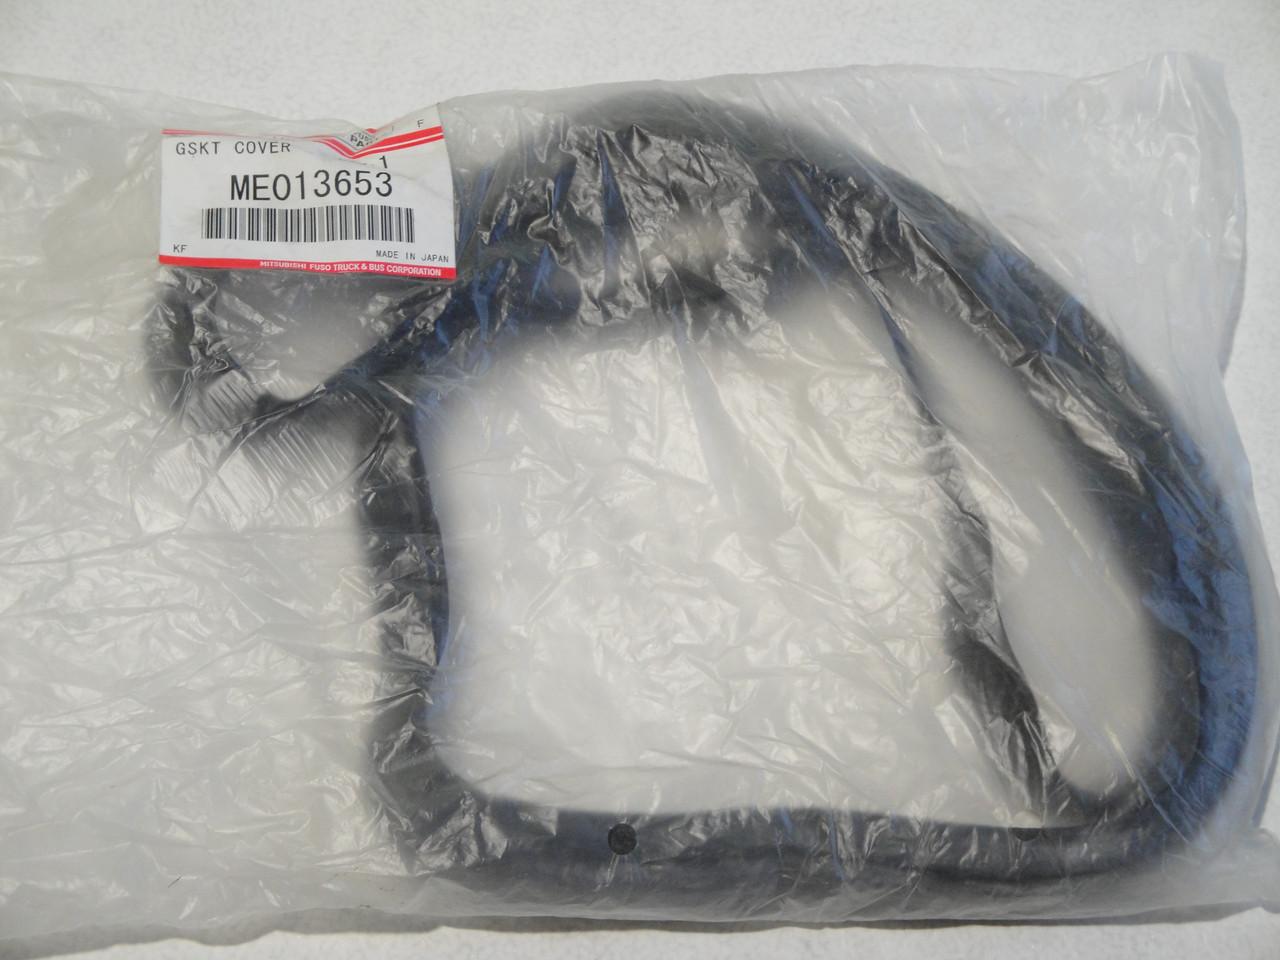 Прокладка клапанной крышки MITSUBISHI CANTER FUSO 659/859 (4D34T) (ME013653)